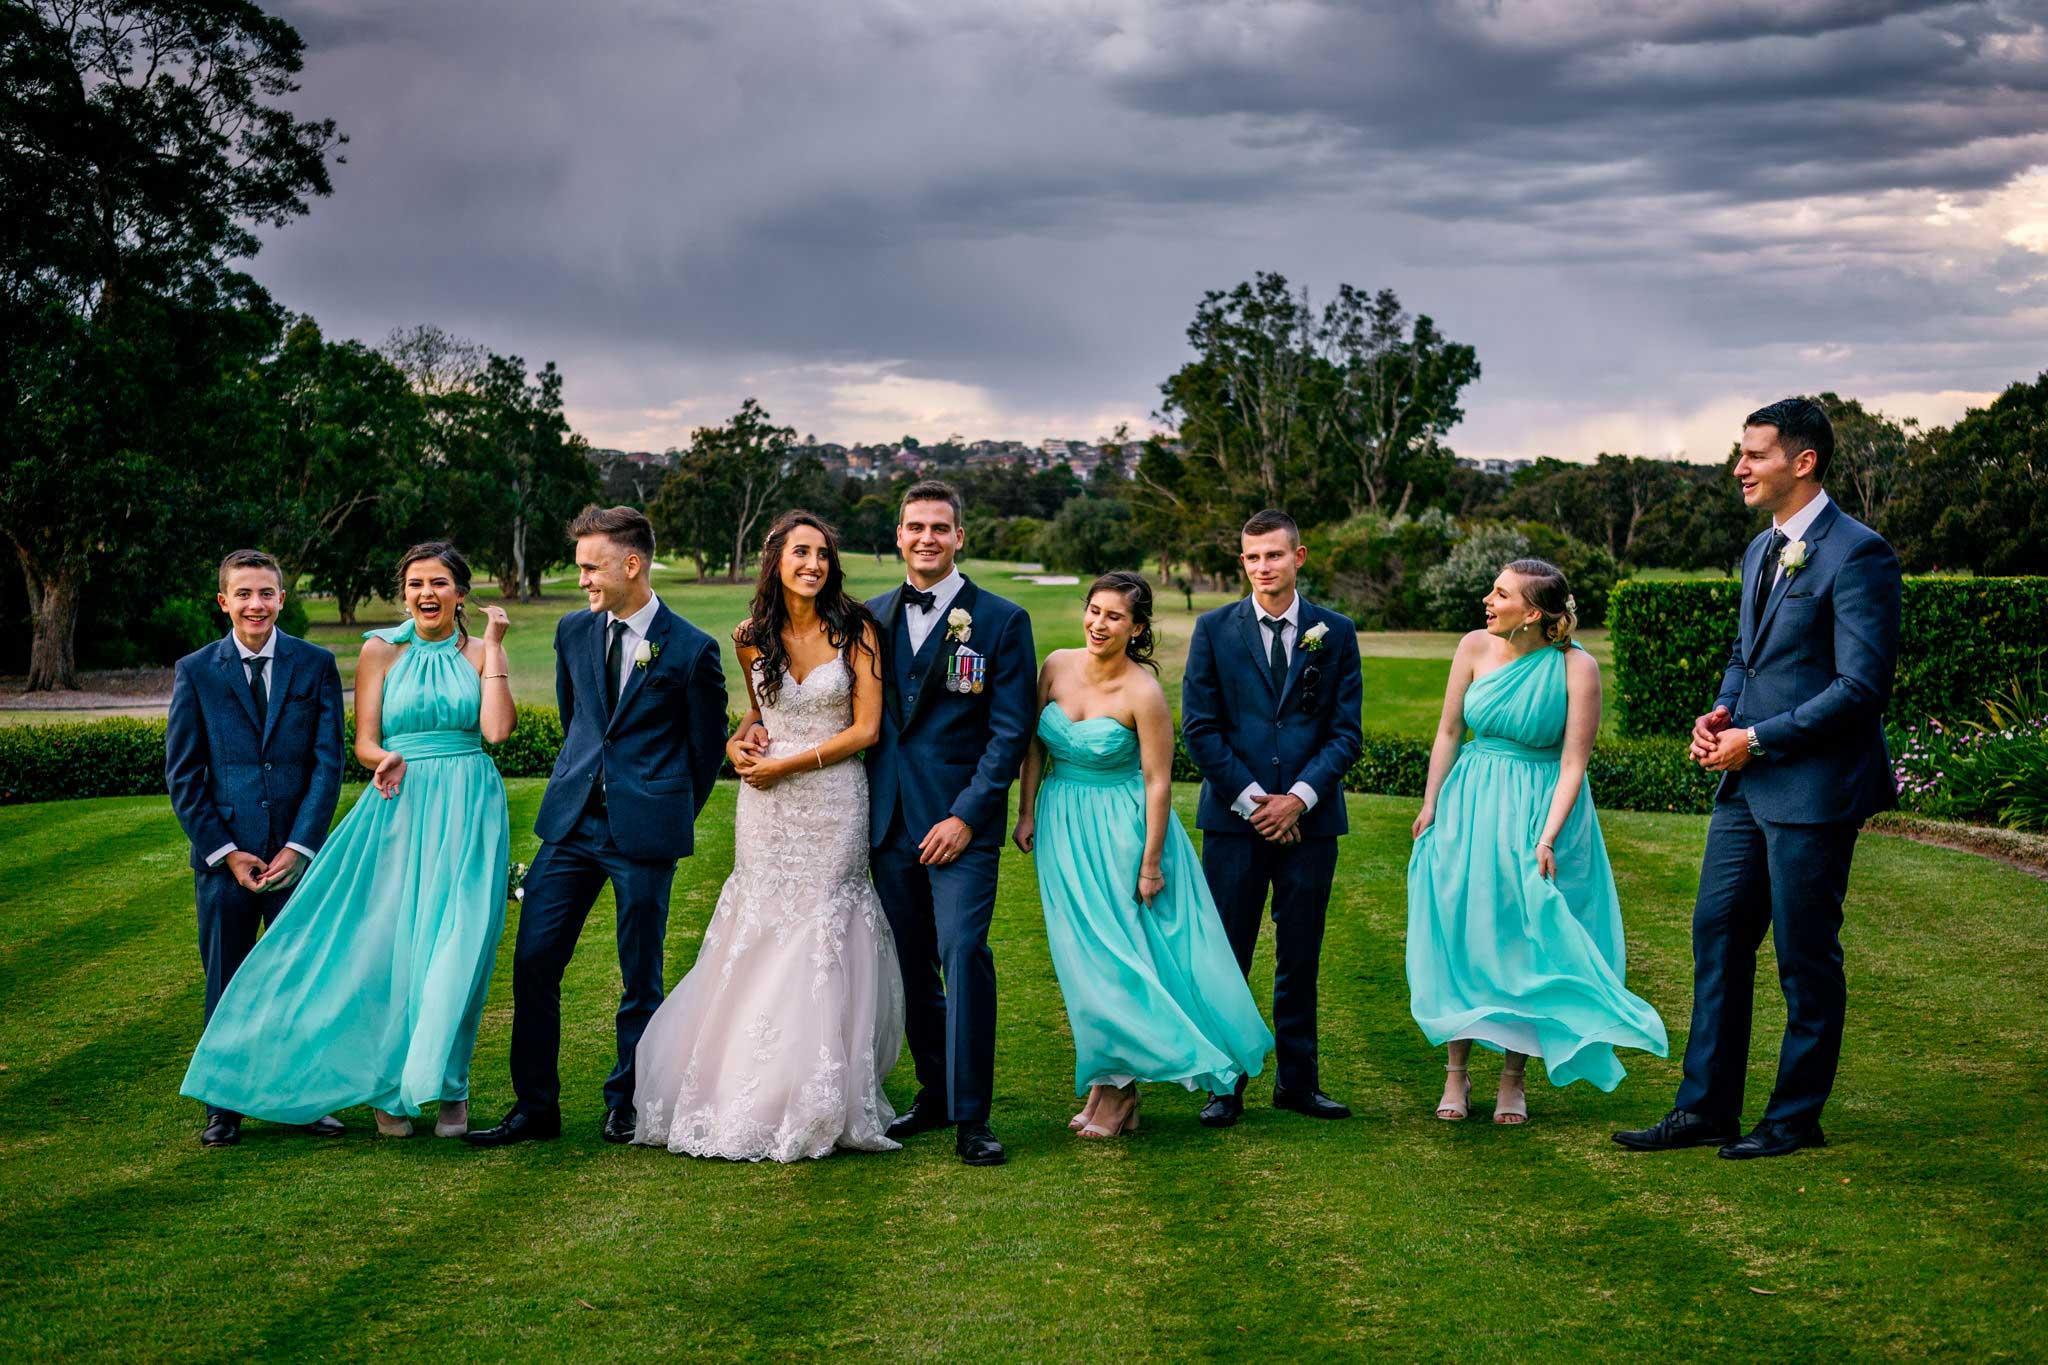 Bridal party having fun at Manly Golf Club wedding reception